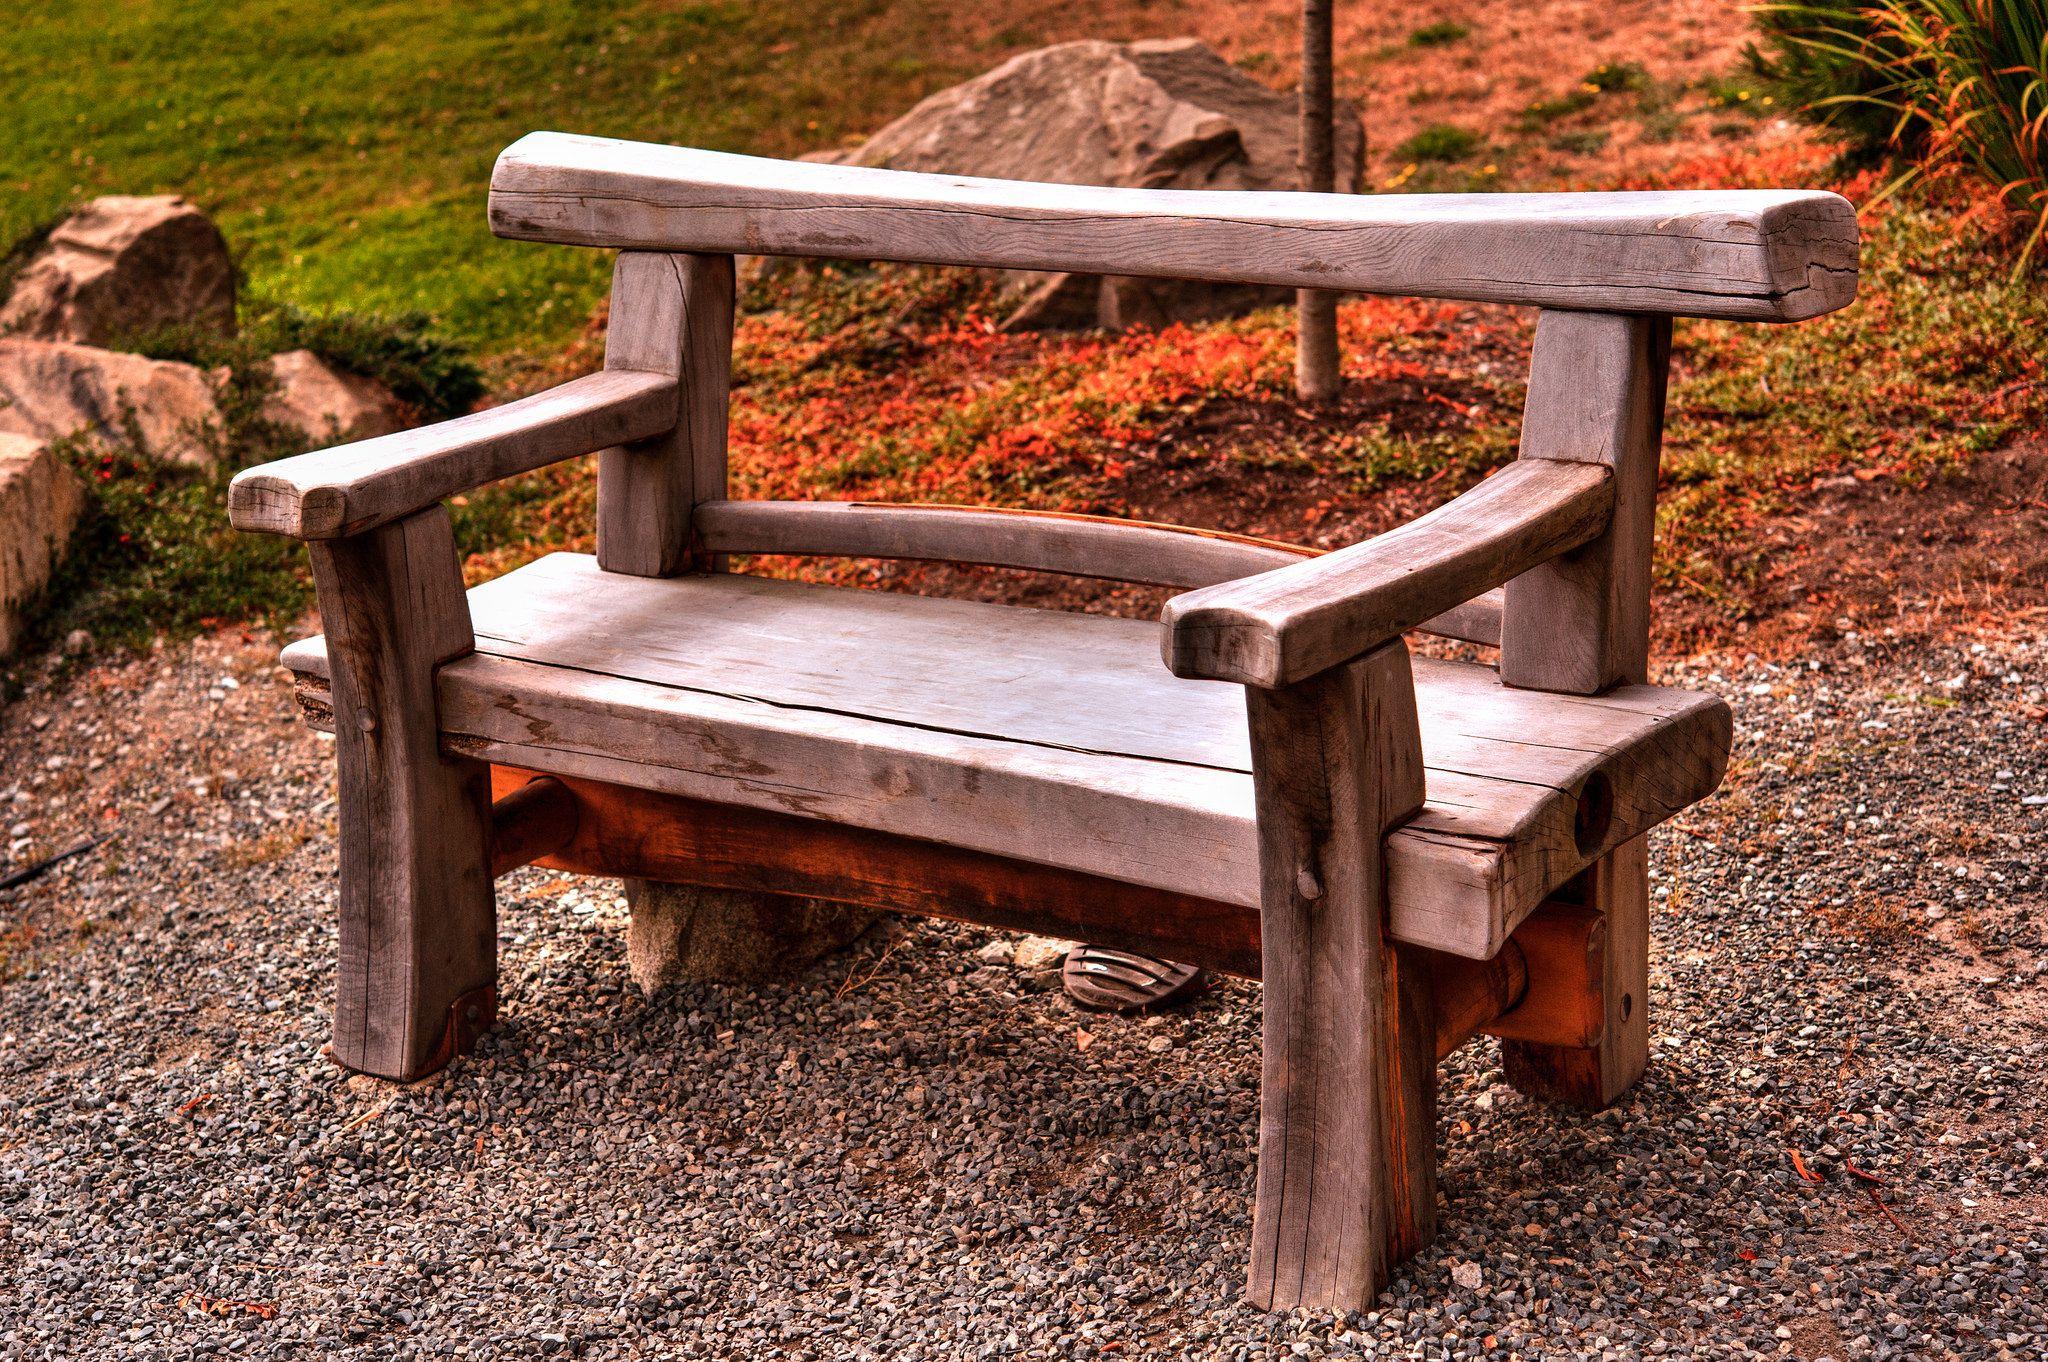 Japanese Bench In 2020 Garden Bench Plans Outdoor 400 x 300